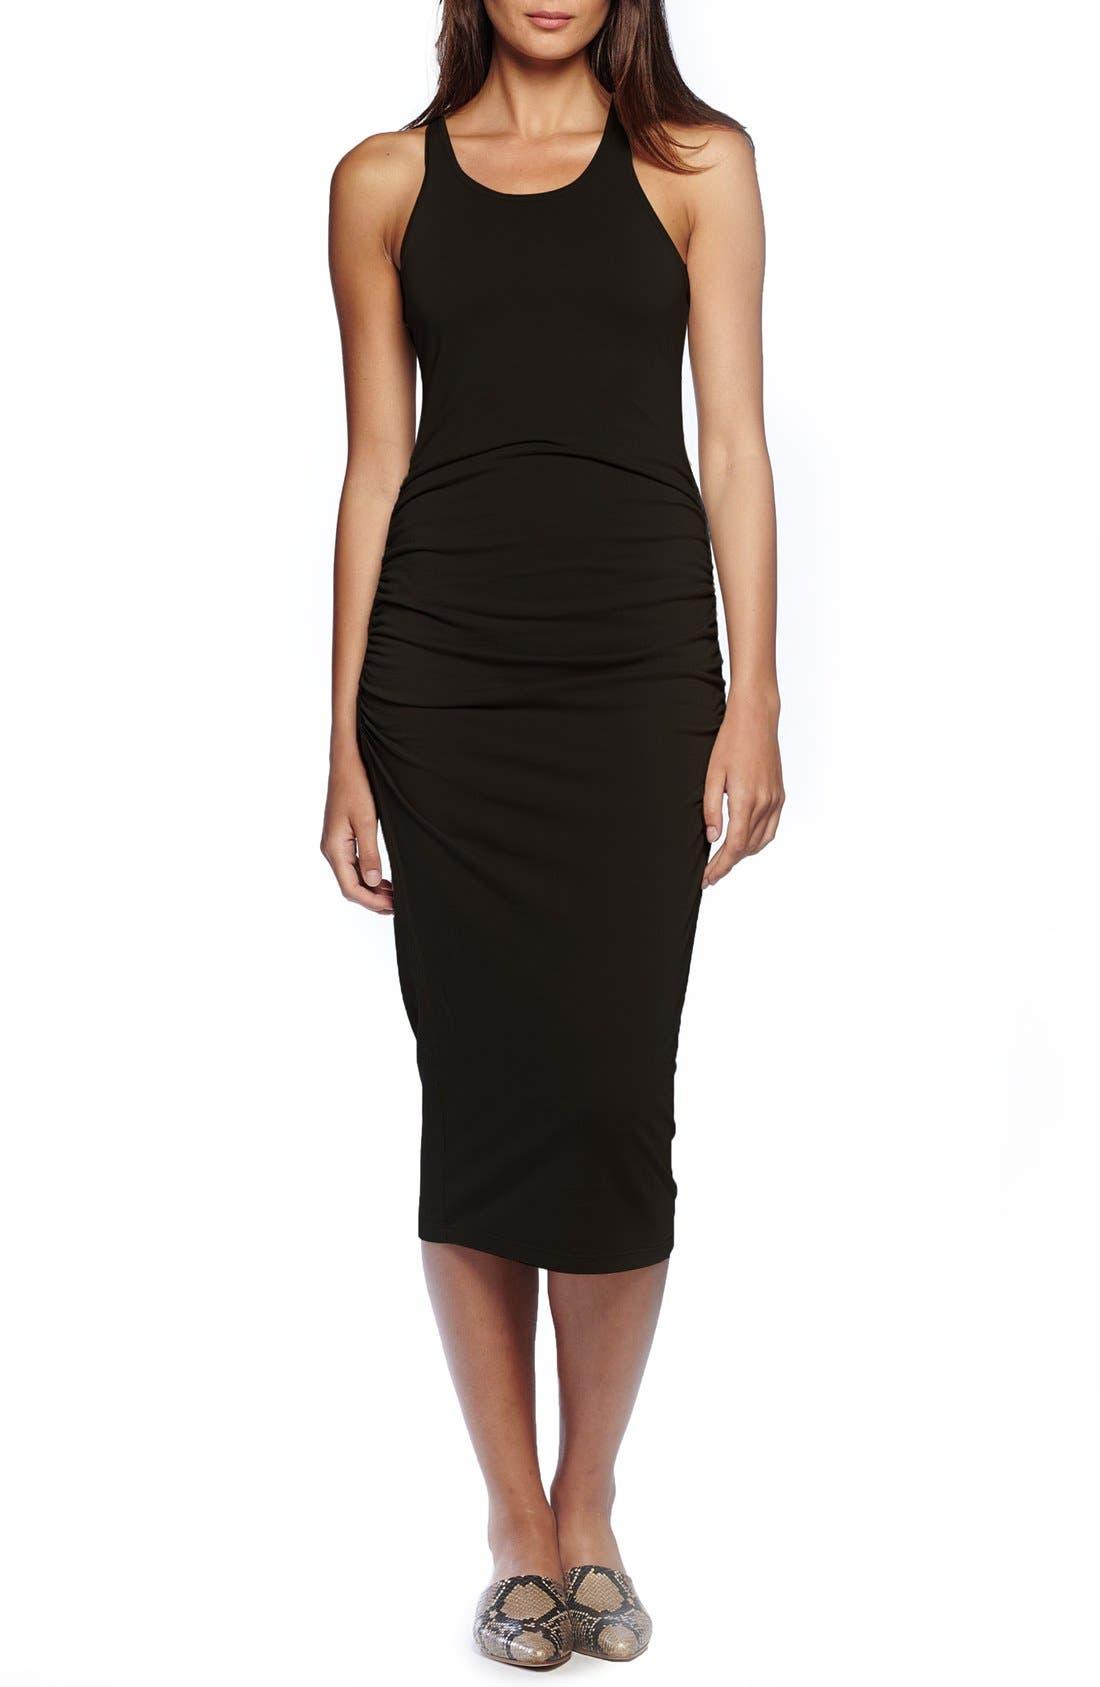 MICHAEL STARS Racerback Midi Dress, Main, color, BLACK